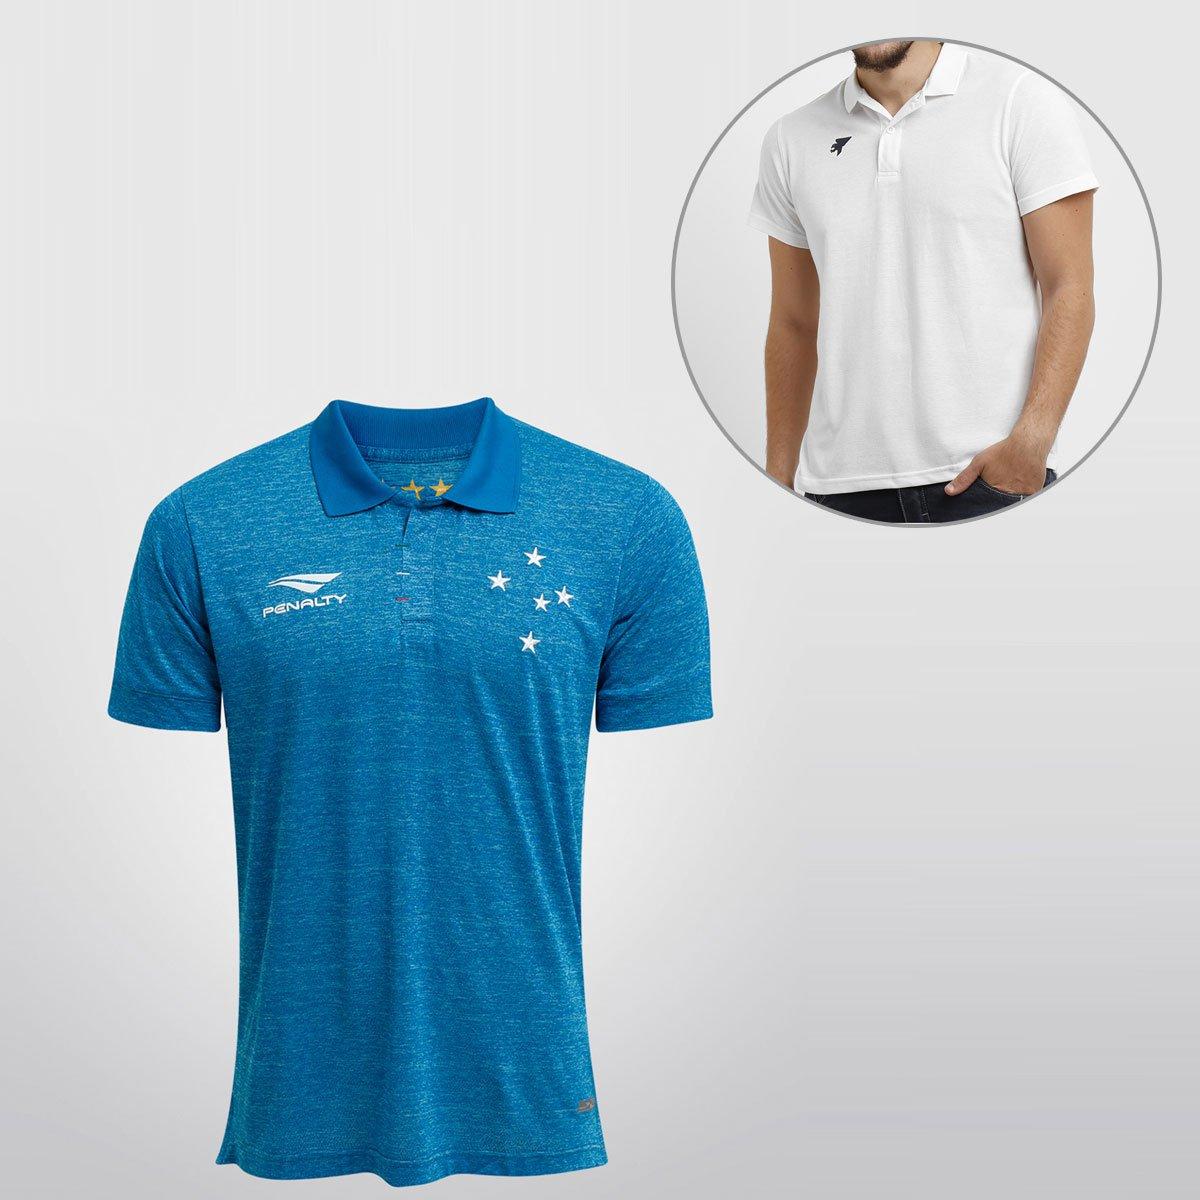 2b9756b05eb15 Camisa Penalty Cruzeiro III 15 16 s nº + Camisa Polo Joma - Compre Agora